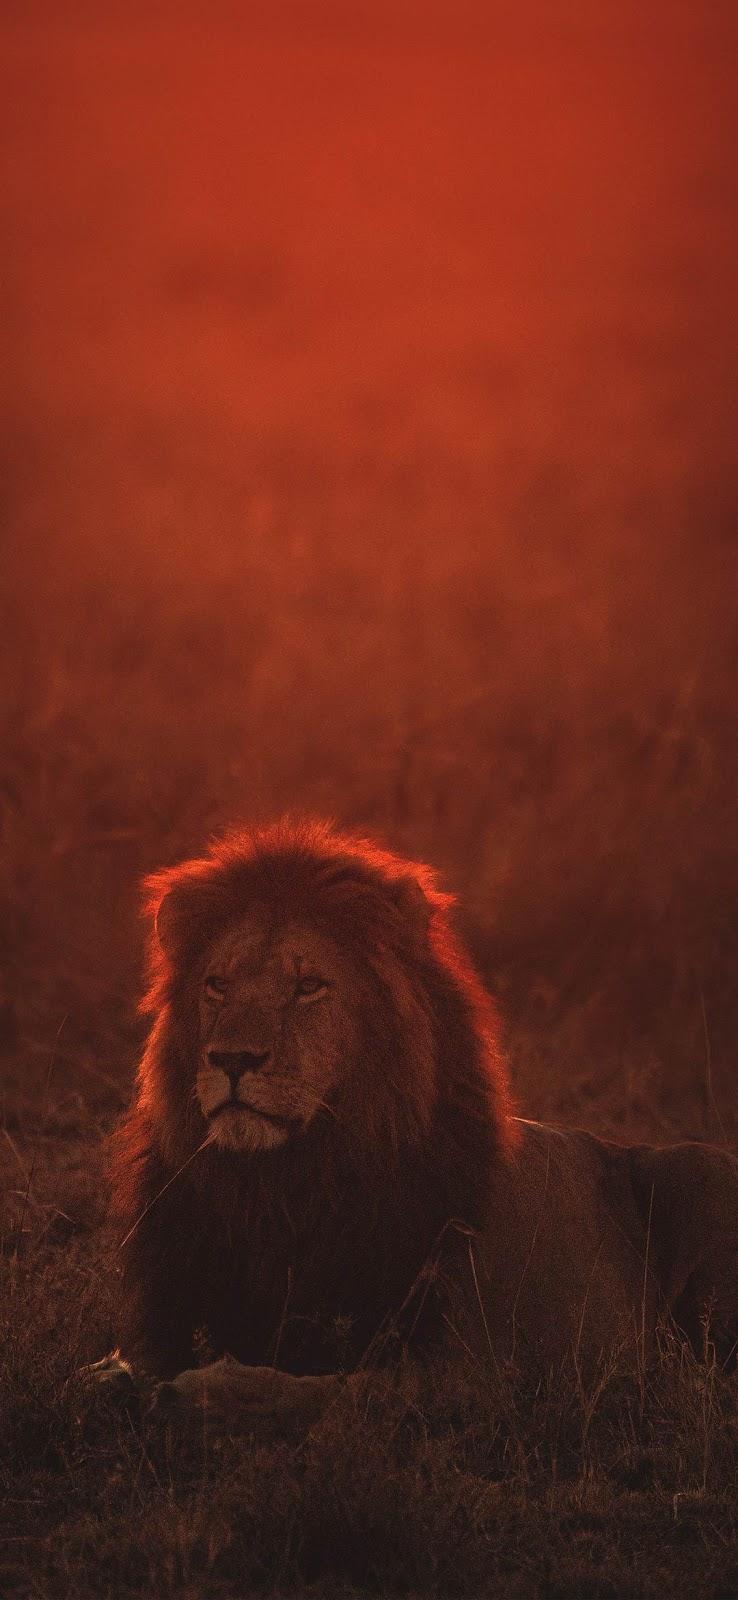 Sad lonely lion